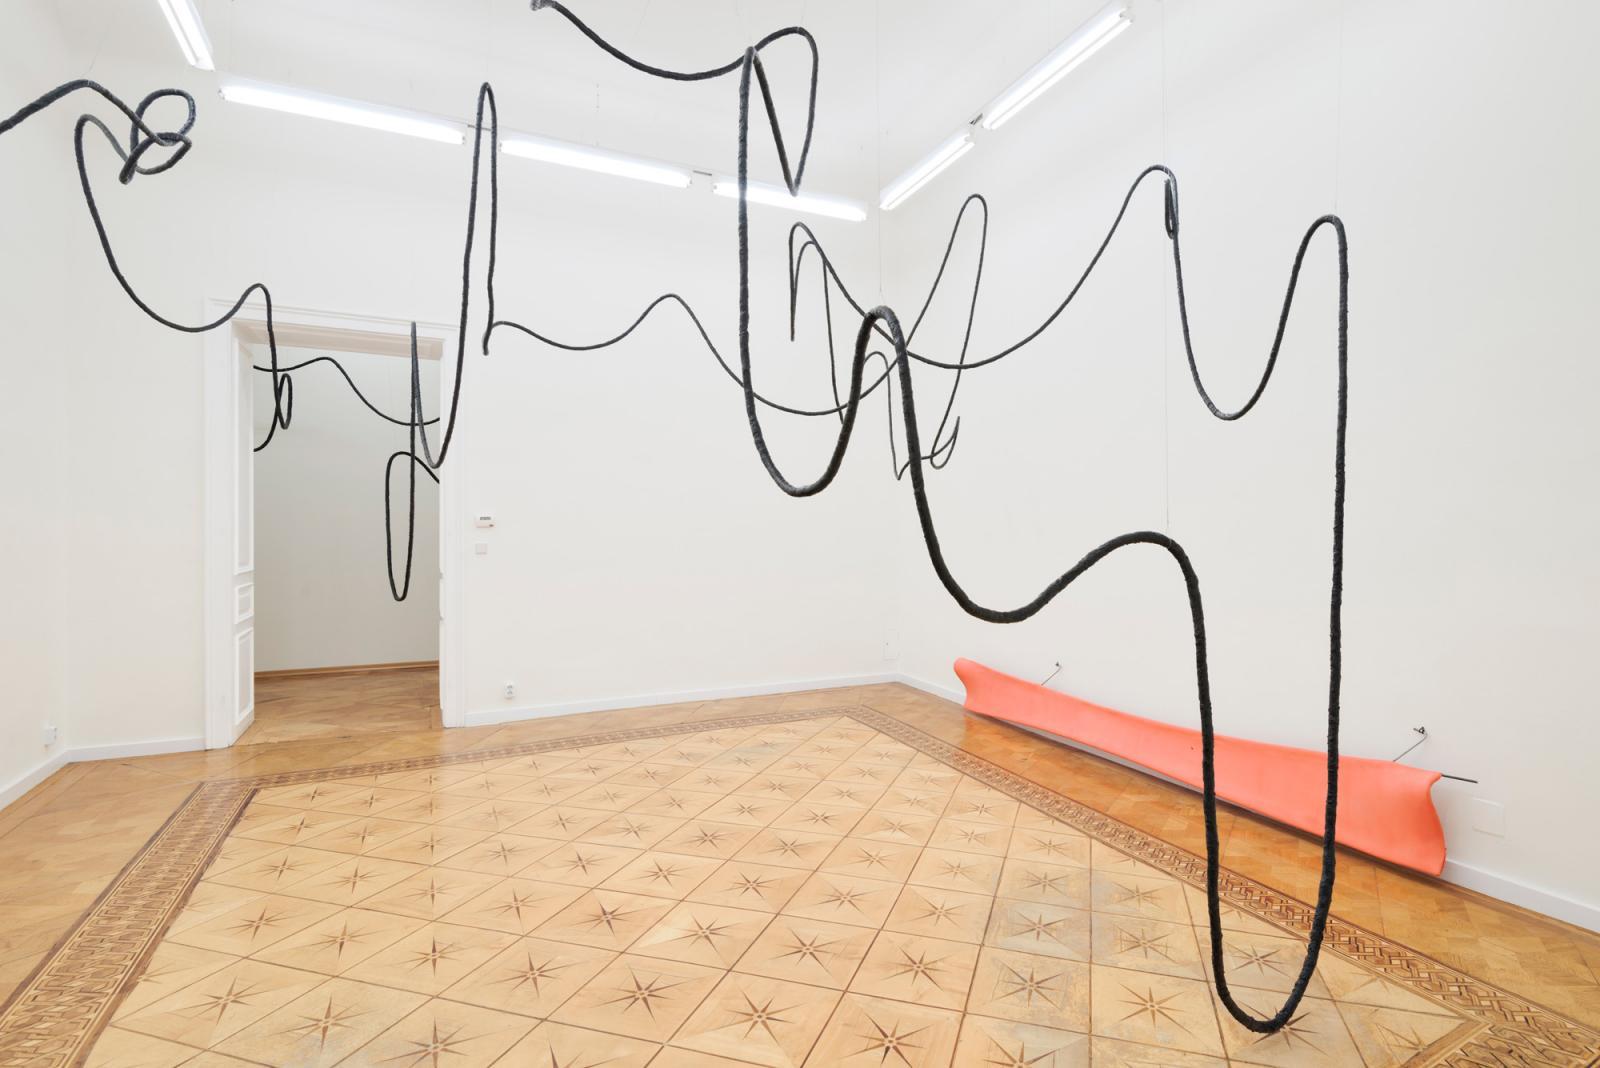 Olga Balema, Marlie Mul, Isa Tarasewicz (2017) installation view at Croy Nielsen